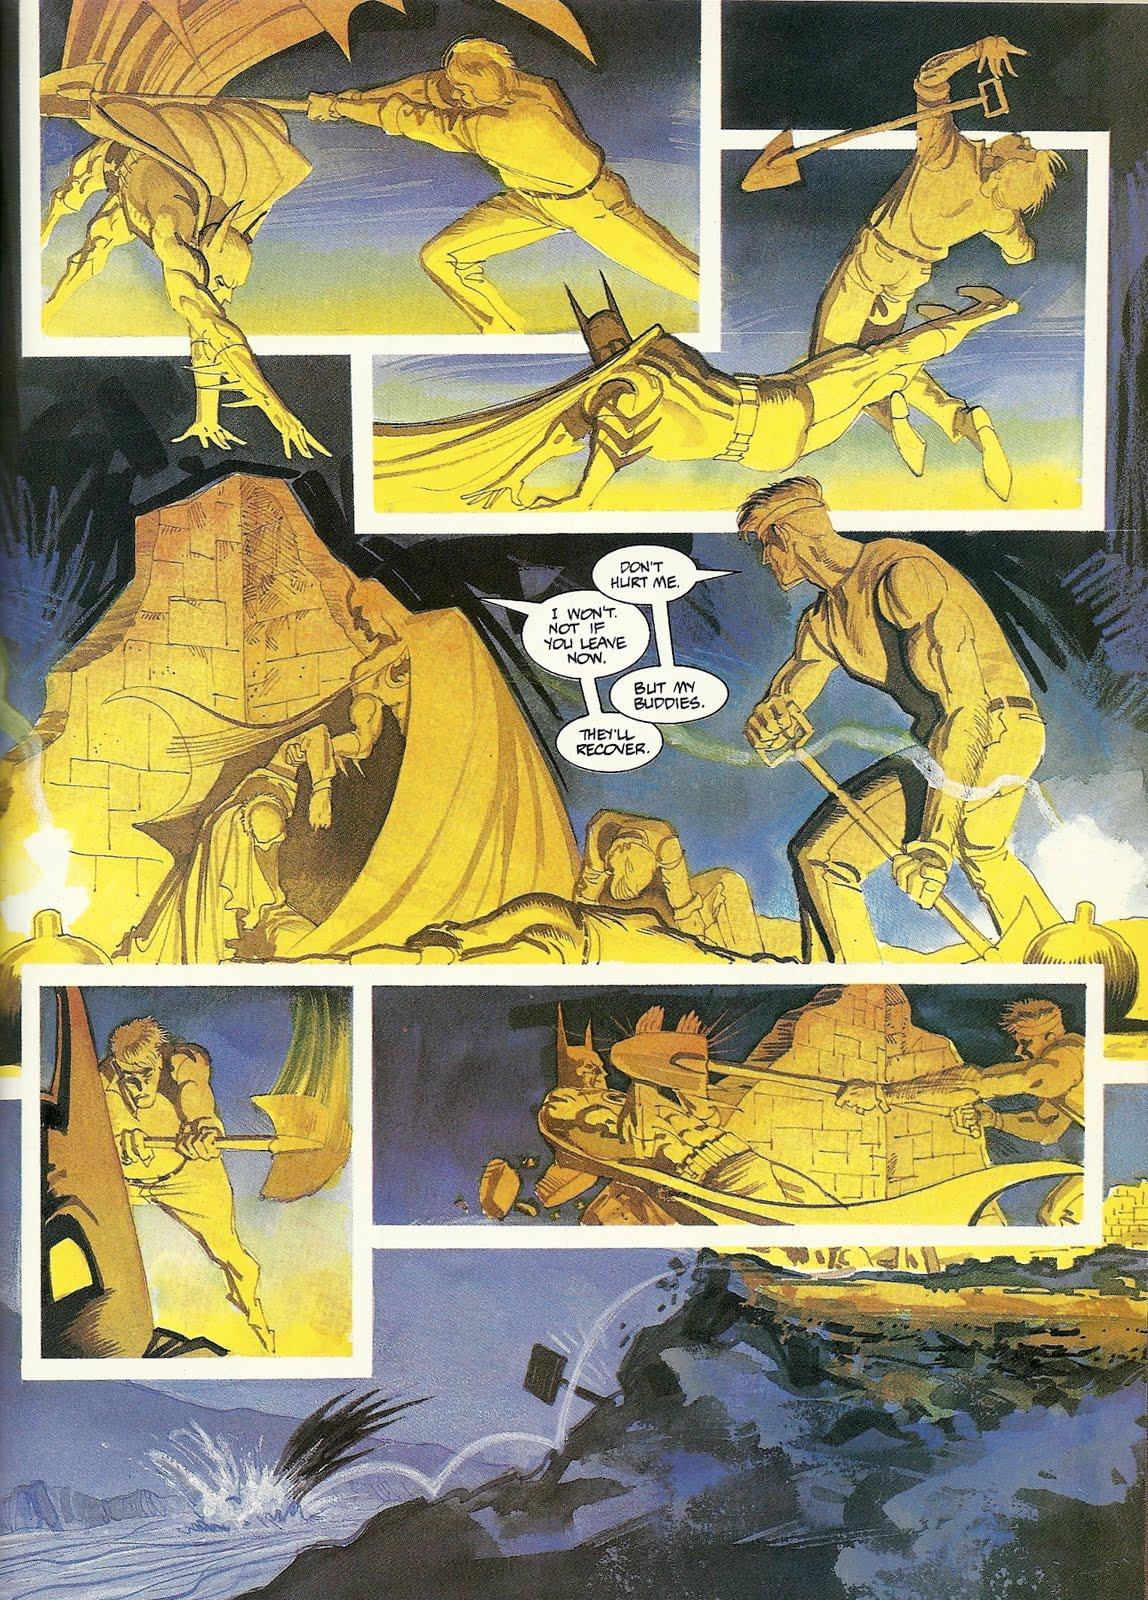 super-comics of the time.